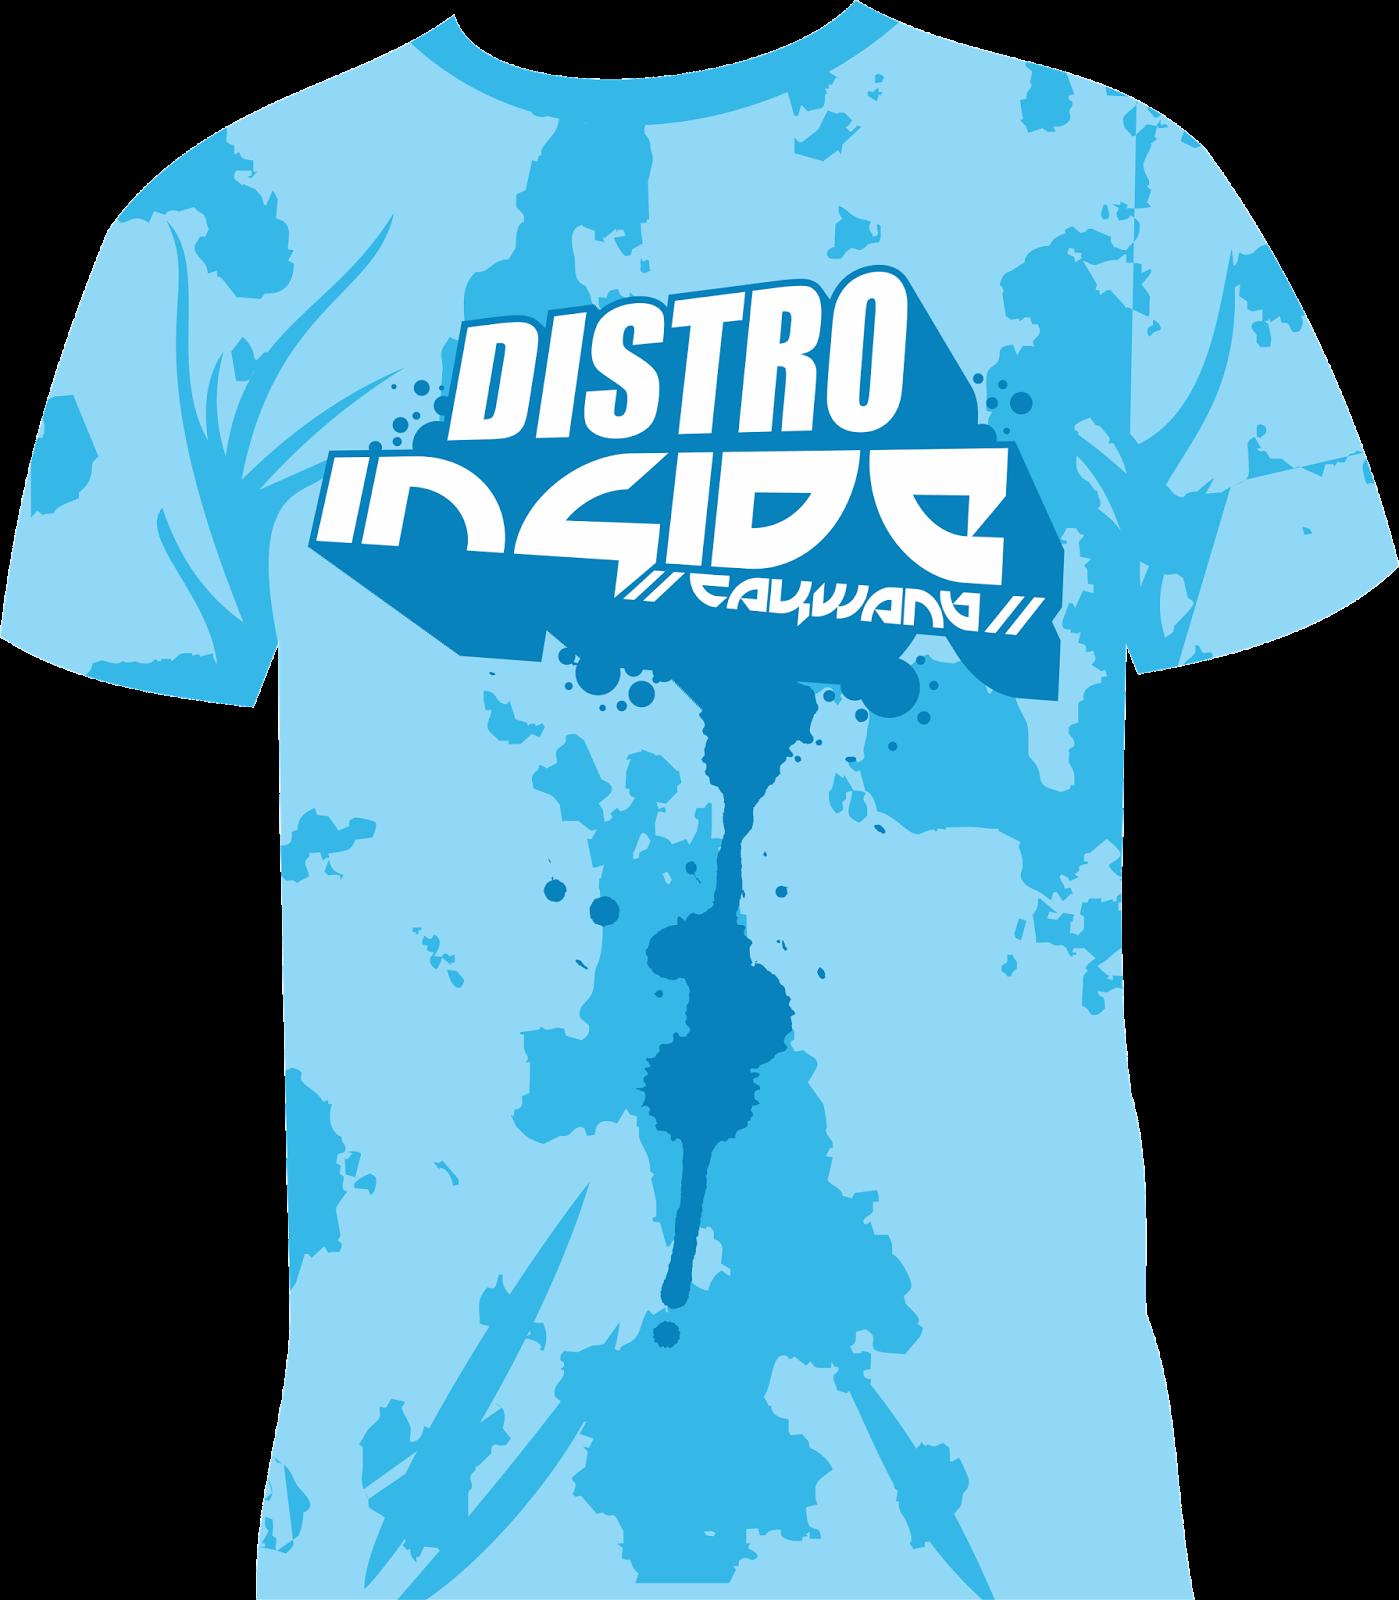 Kumpulan Desain TShirt Baju Distro Atau Kaos Oblong